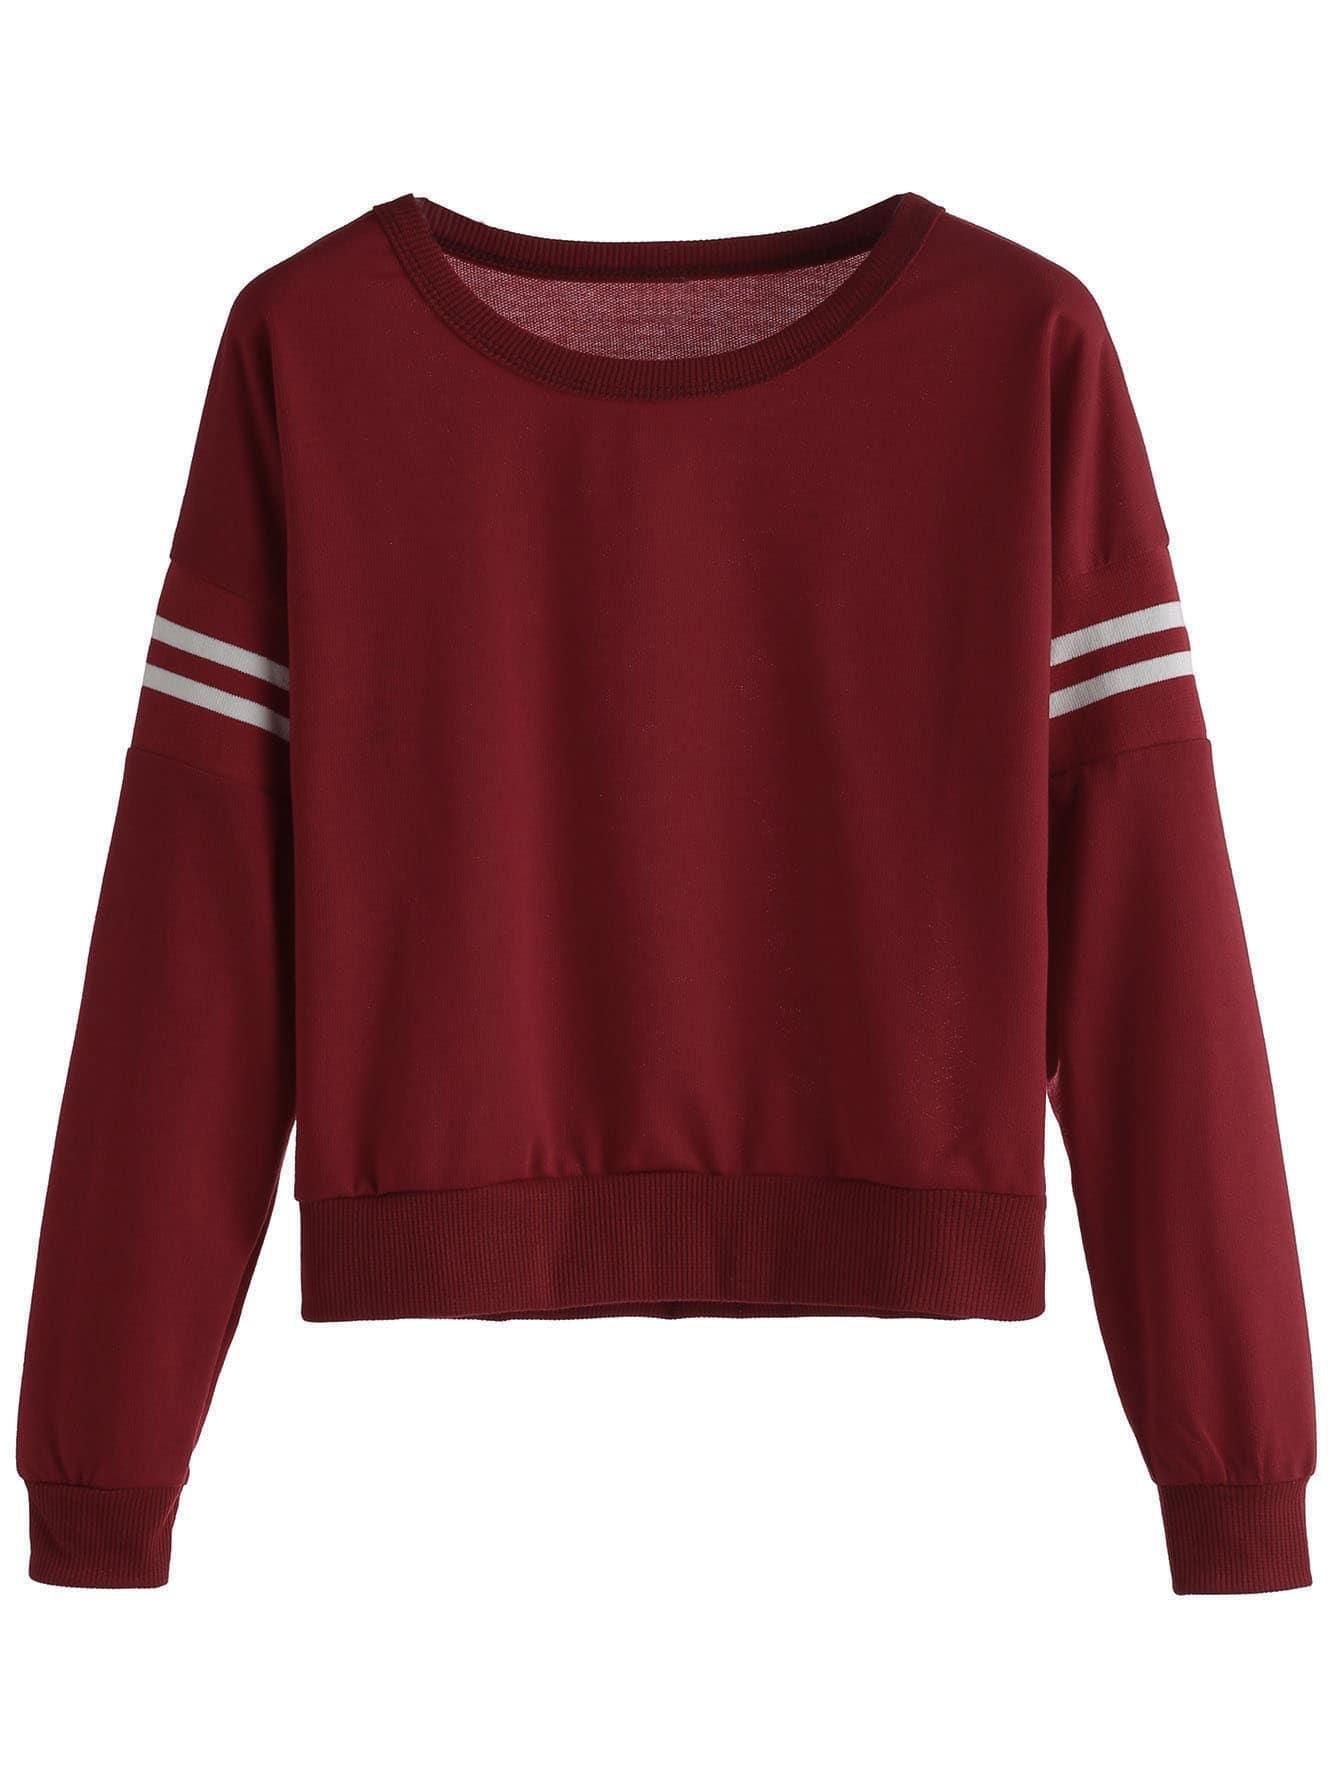 burgundy varsity striped crop sweatshirtfor women romwe